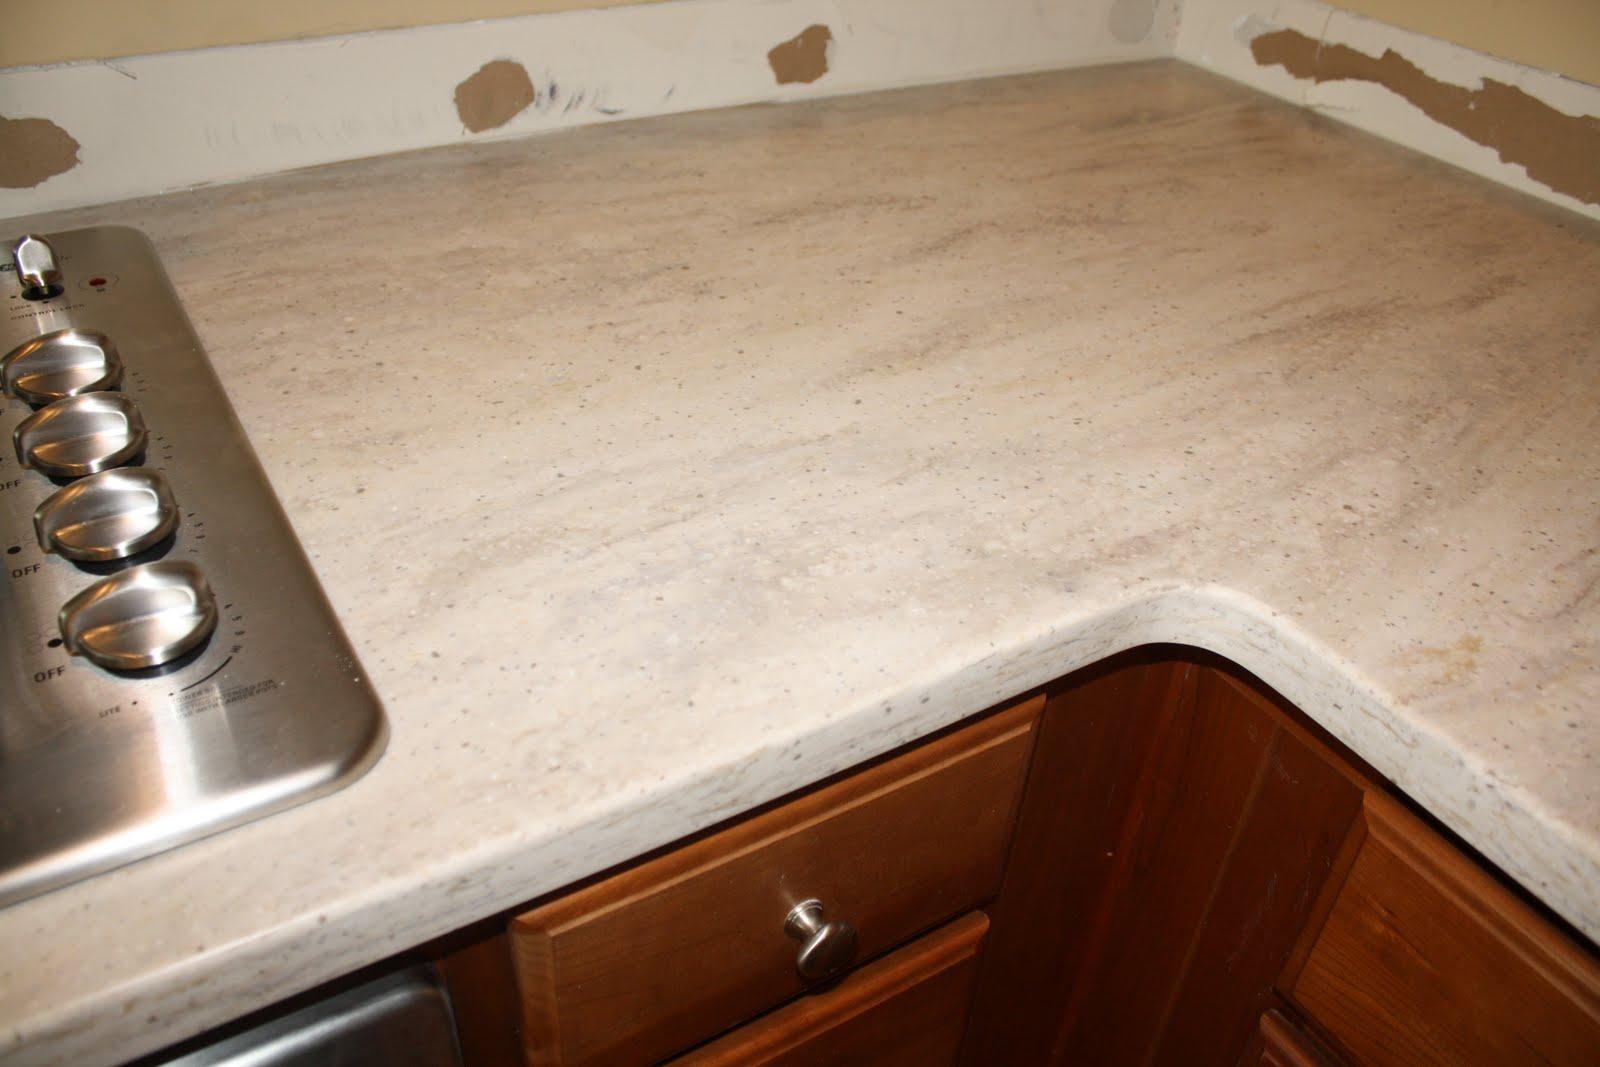 restoring corian countertops home improvement. Black Bedroom Furniture Sets. Home Design Ideas